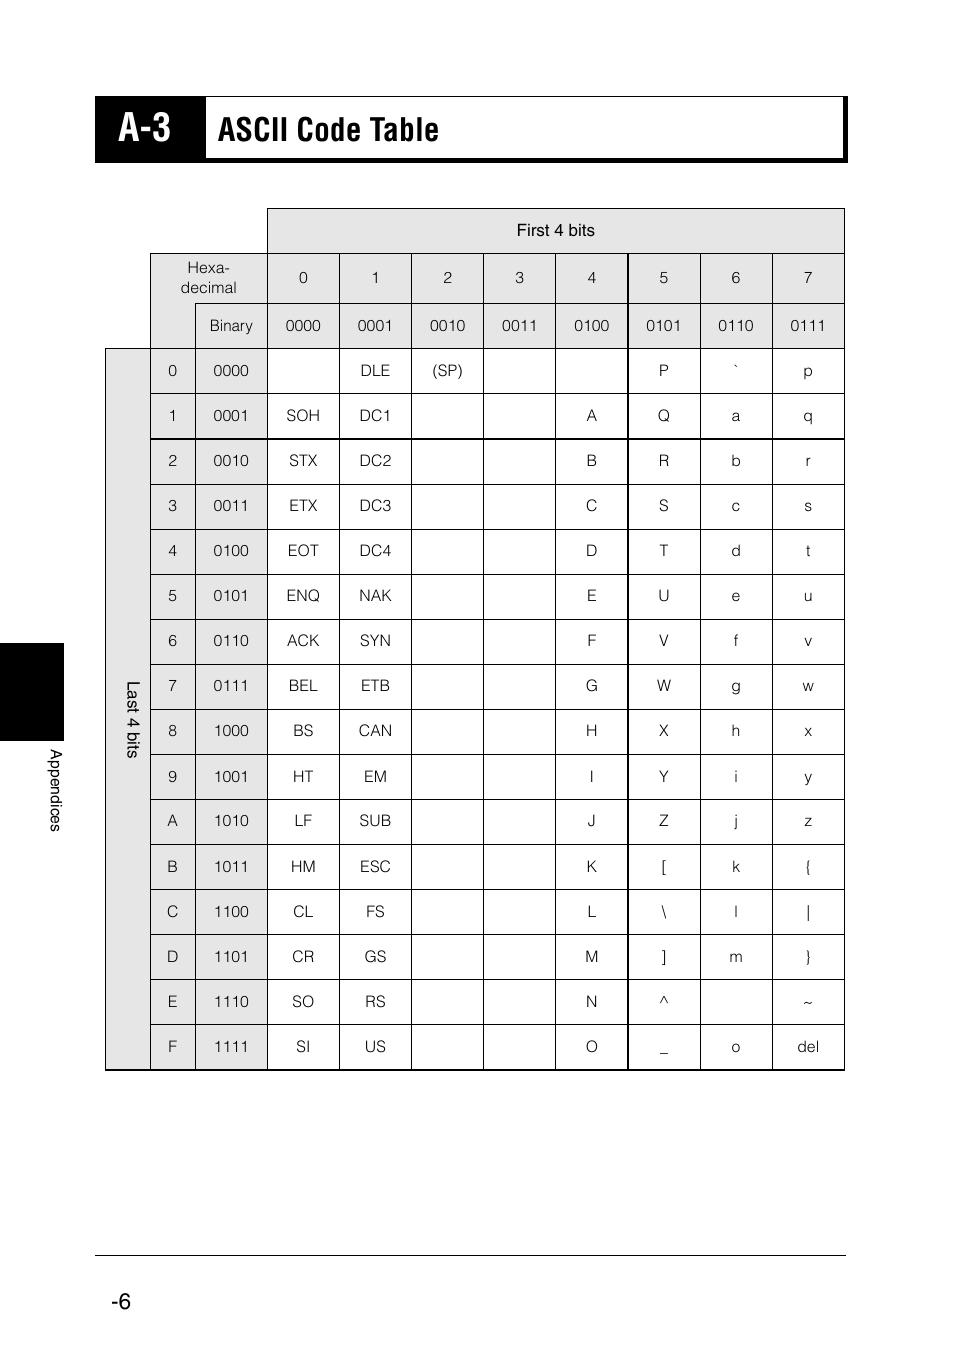 A-6 ascii code table, Ascii code table  KEYENCE BL-N6 Series